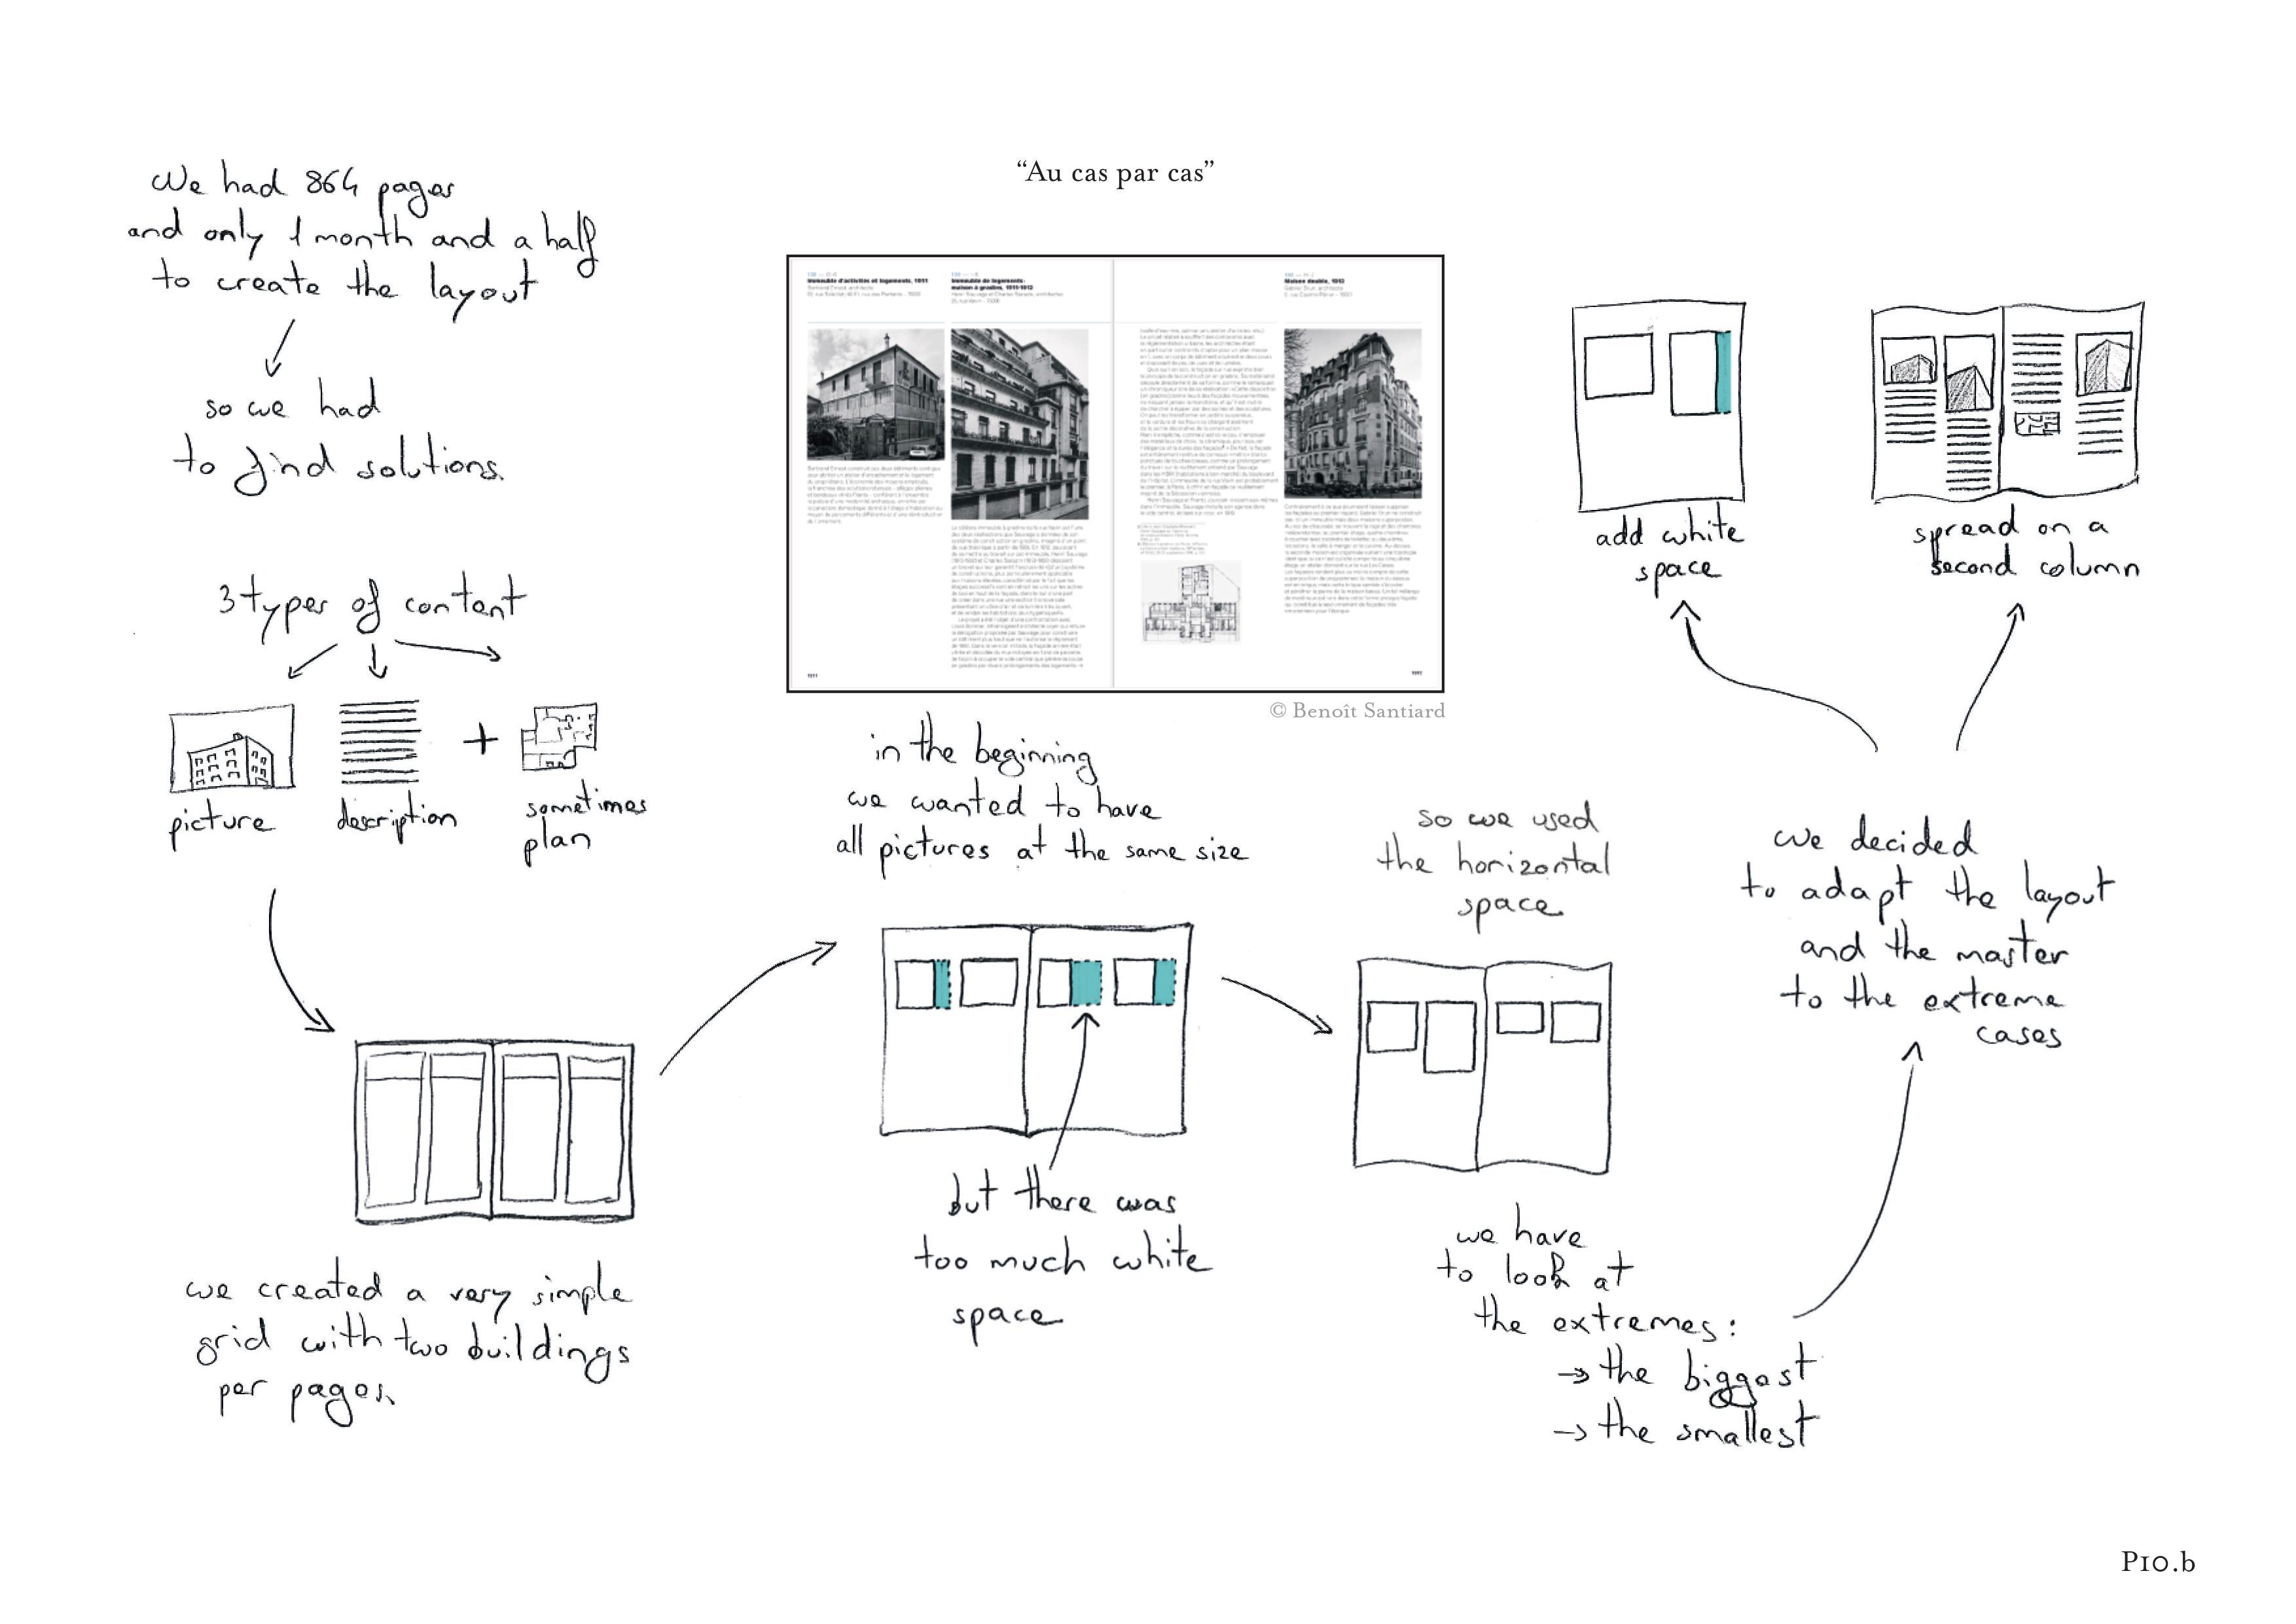 Designing Design Tools Description Schematic Block Diagram Examplejpg